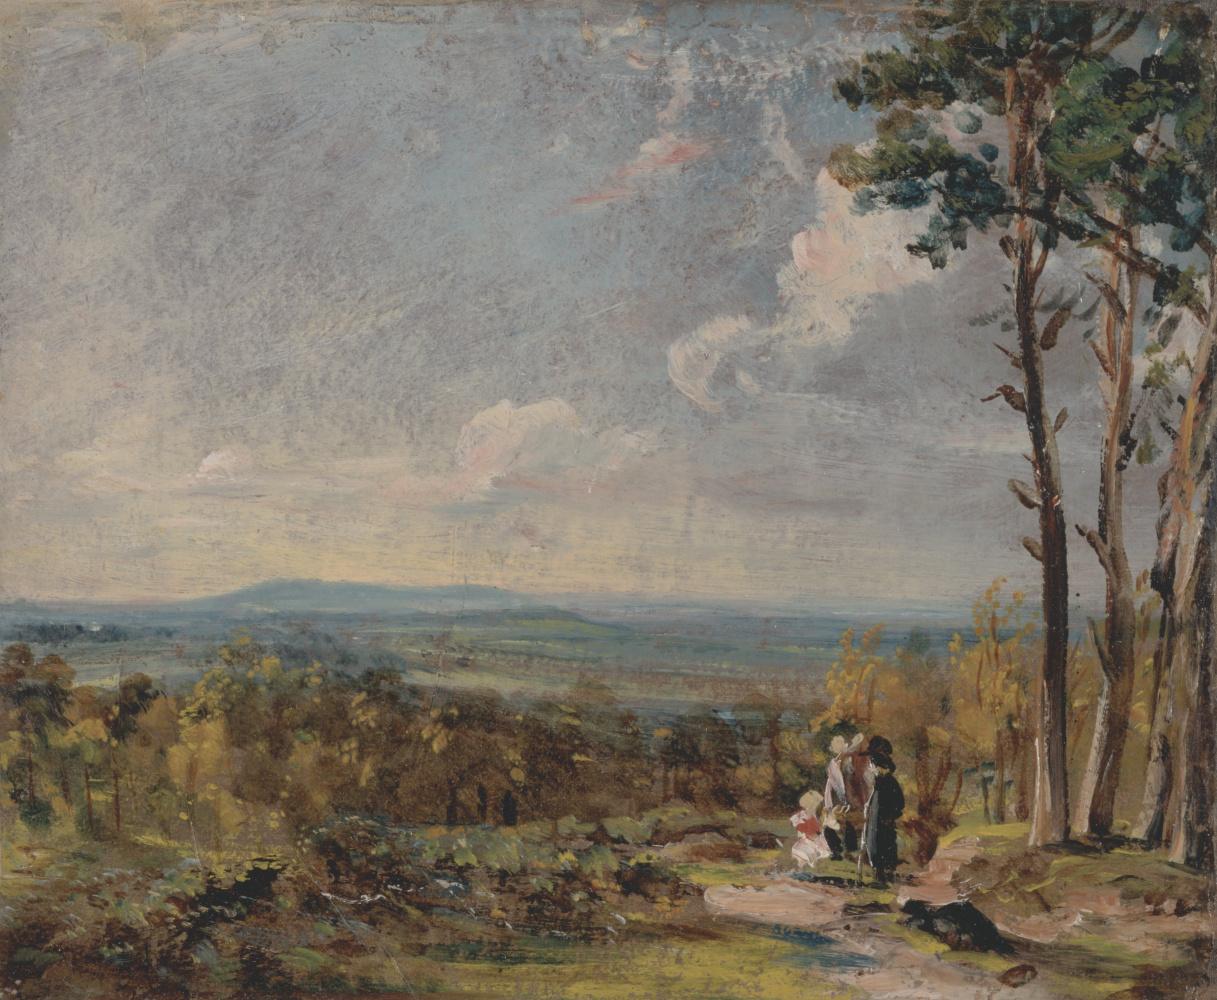 John Constable. Hampstead Heath, valley view